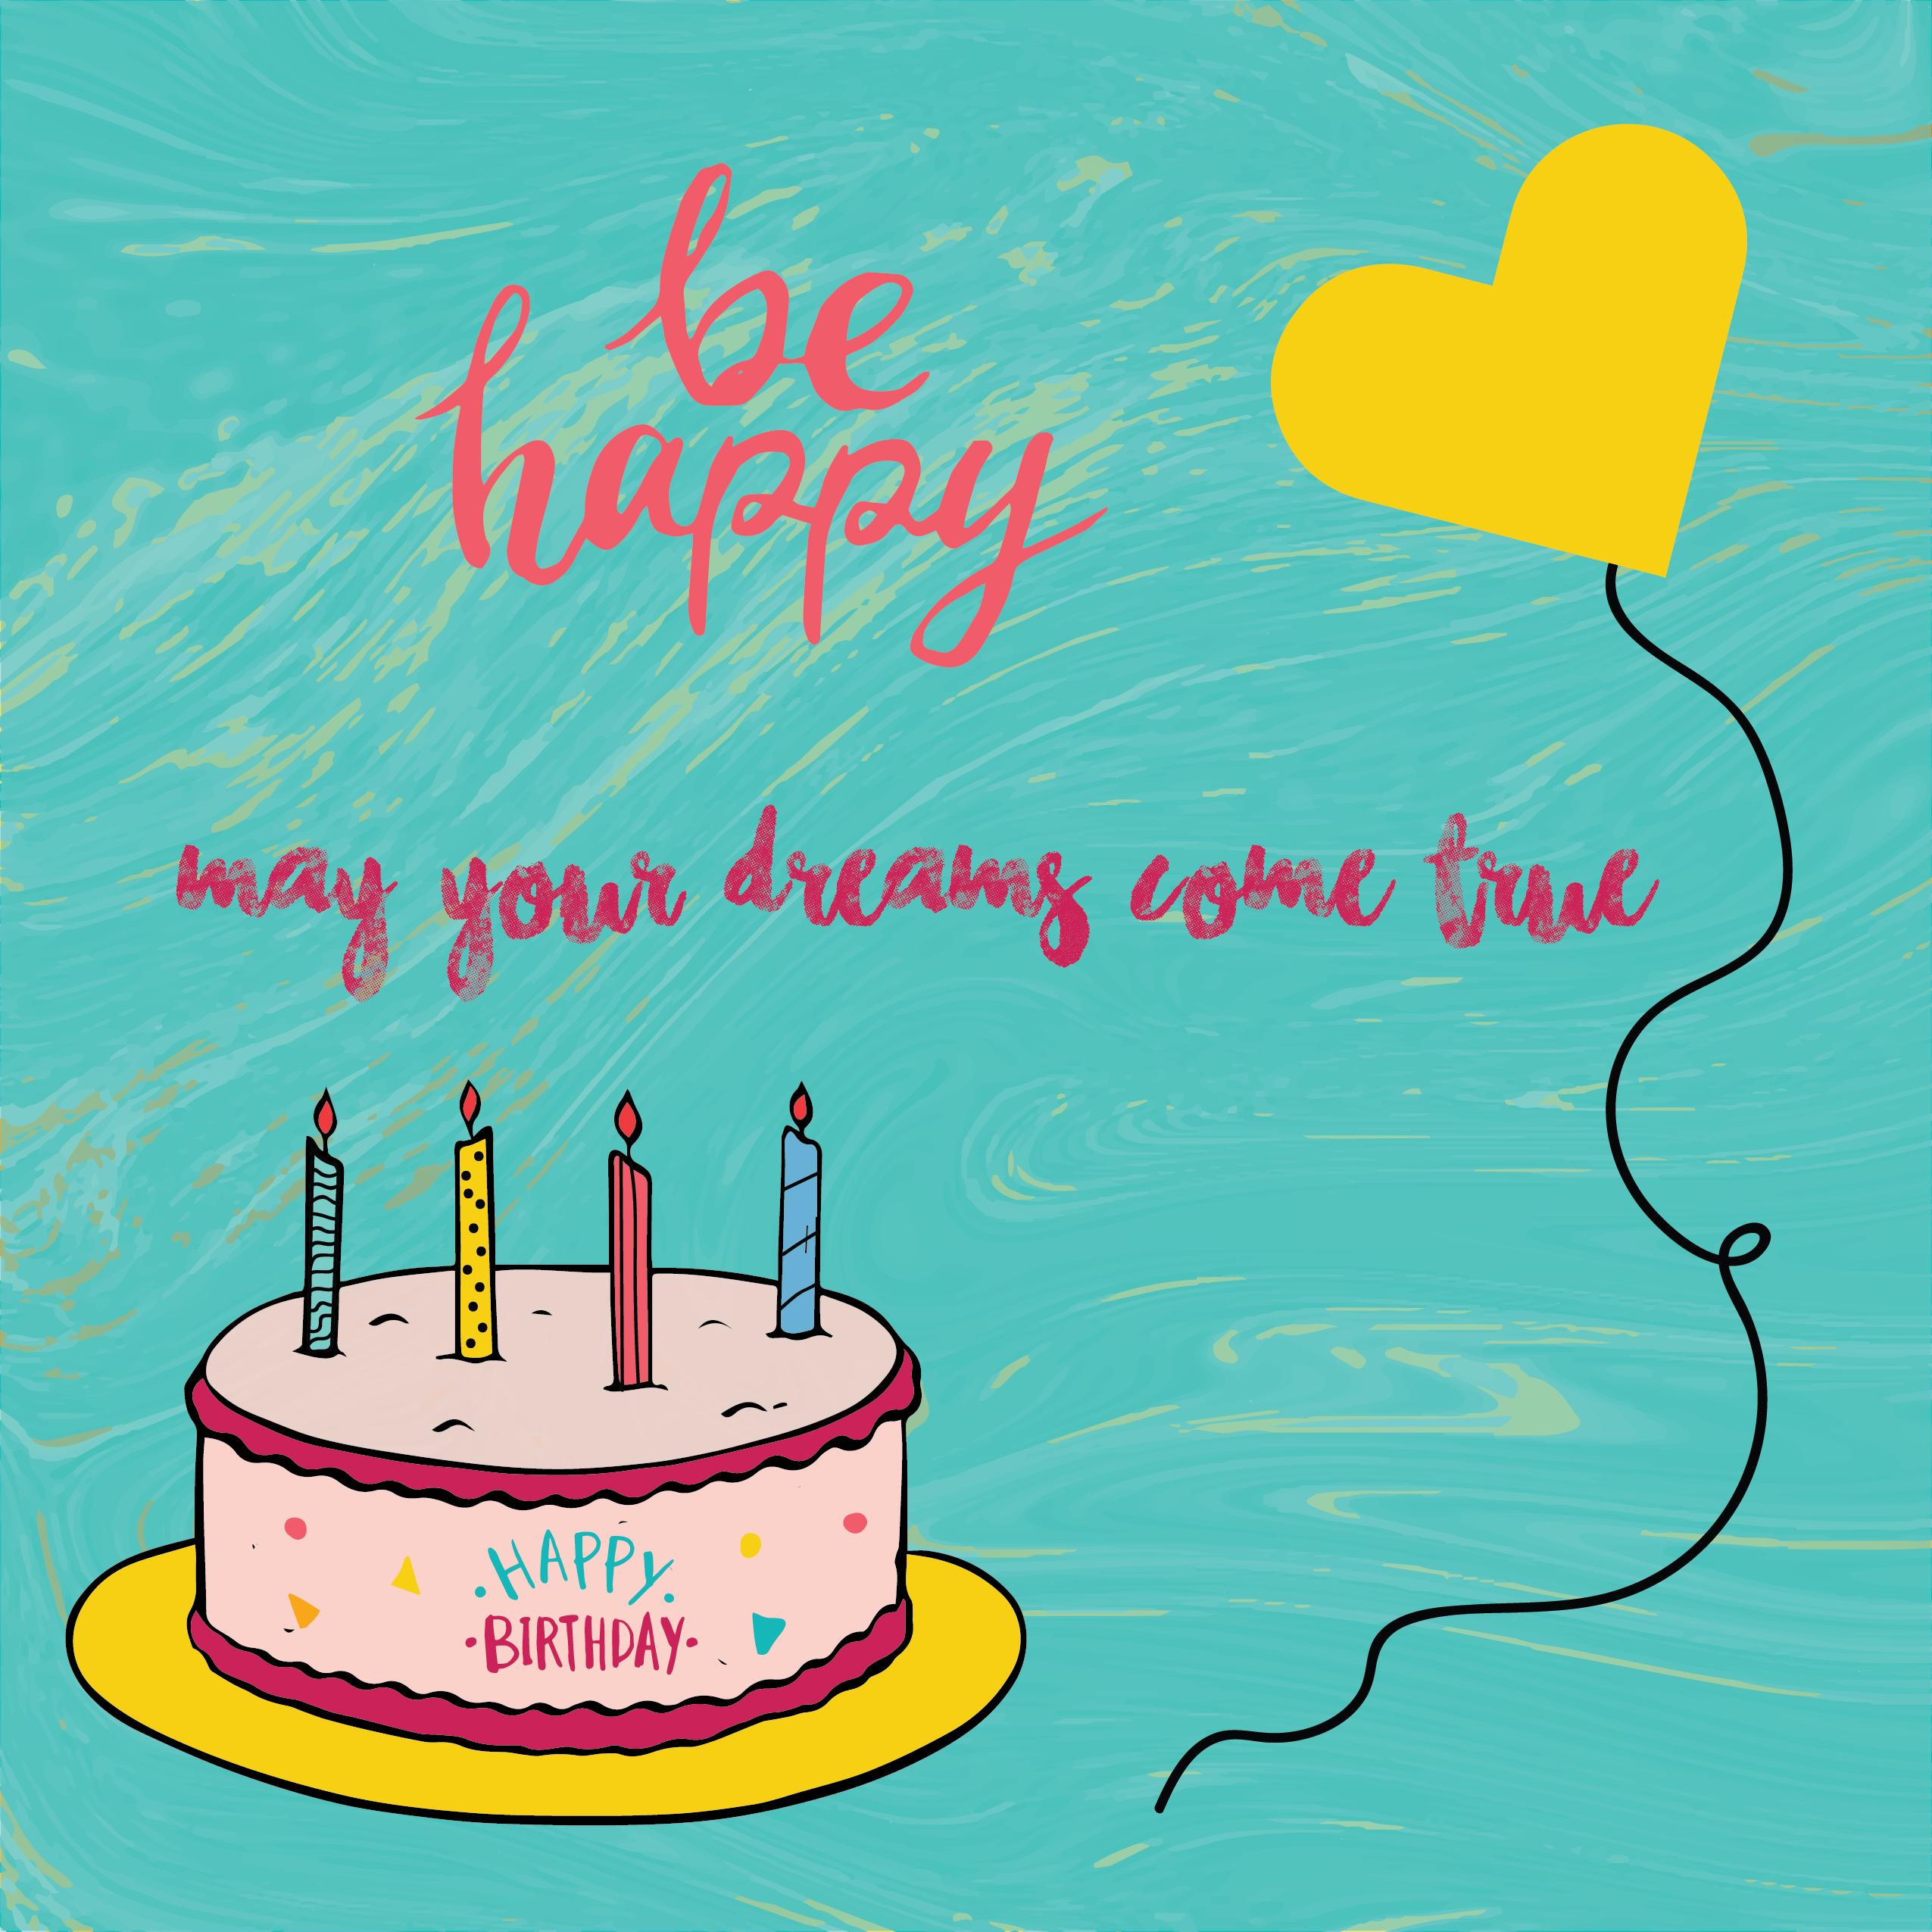 Happy-Birthday-Wishes1